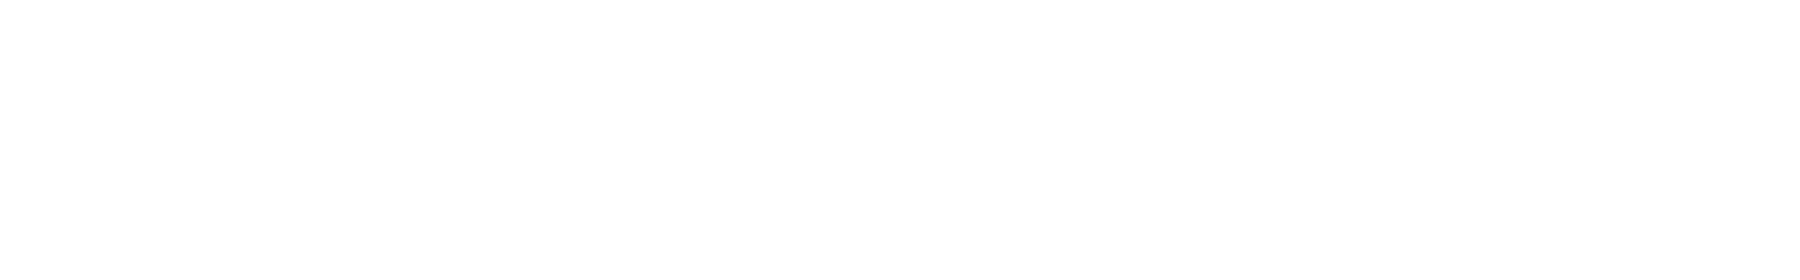 g abs05 021